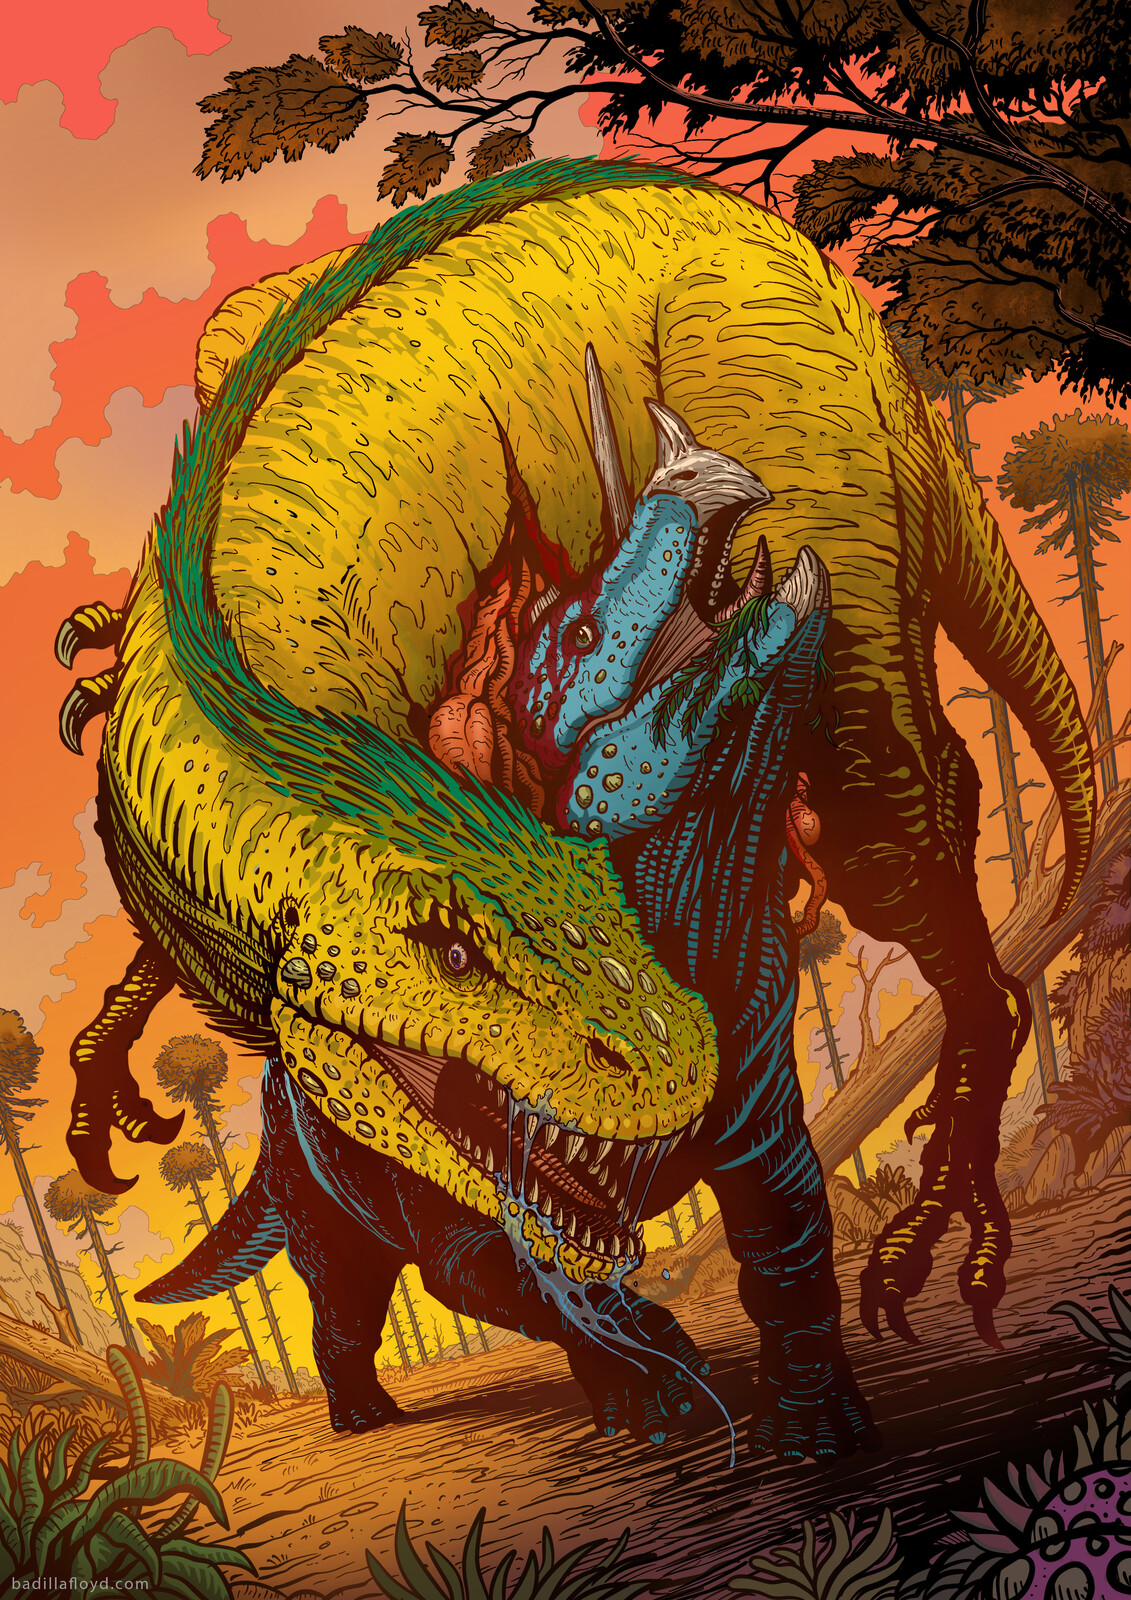 Triceratops vs Tyrannosaurus